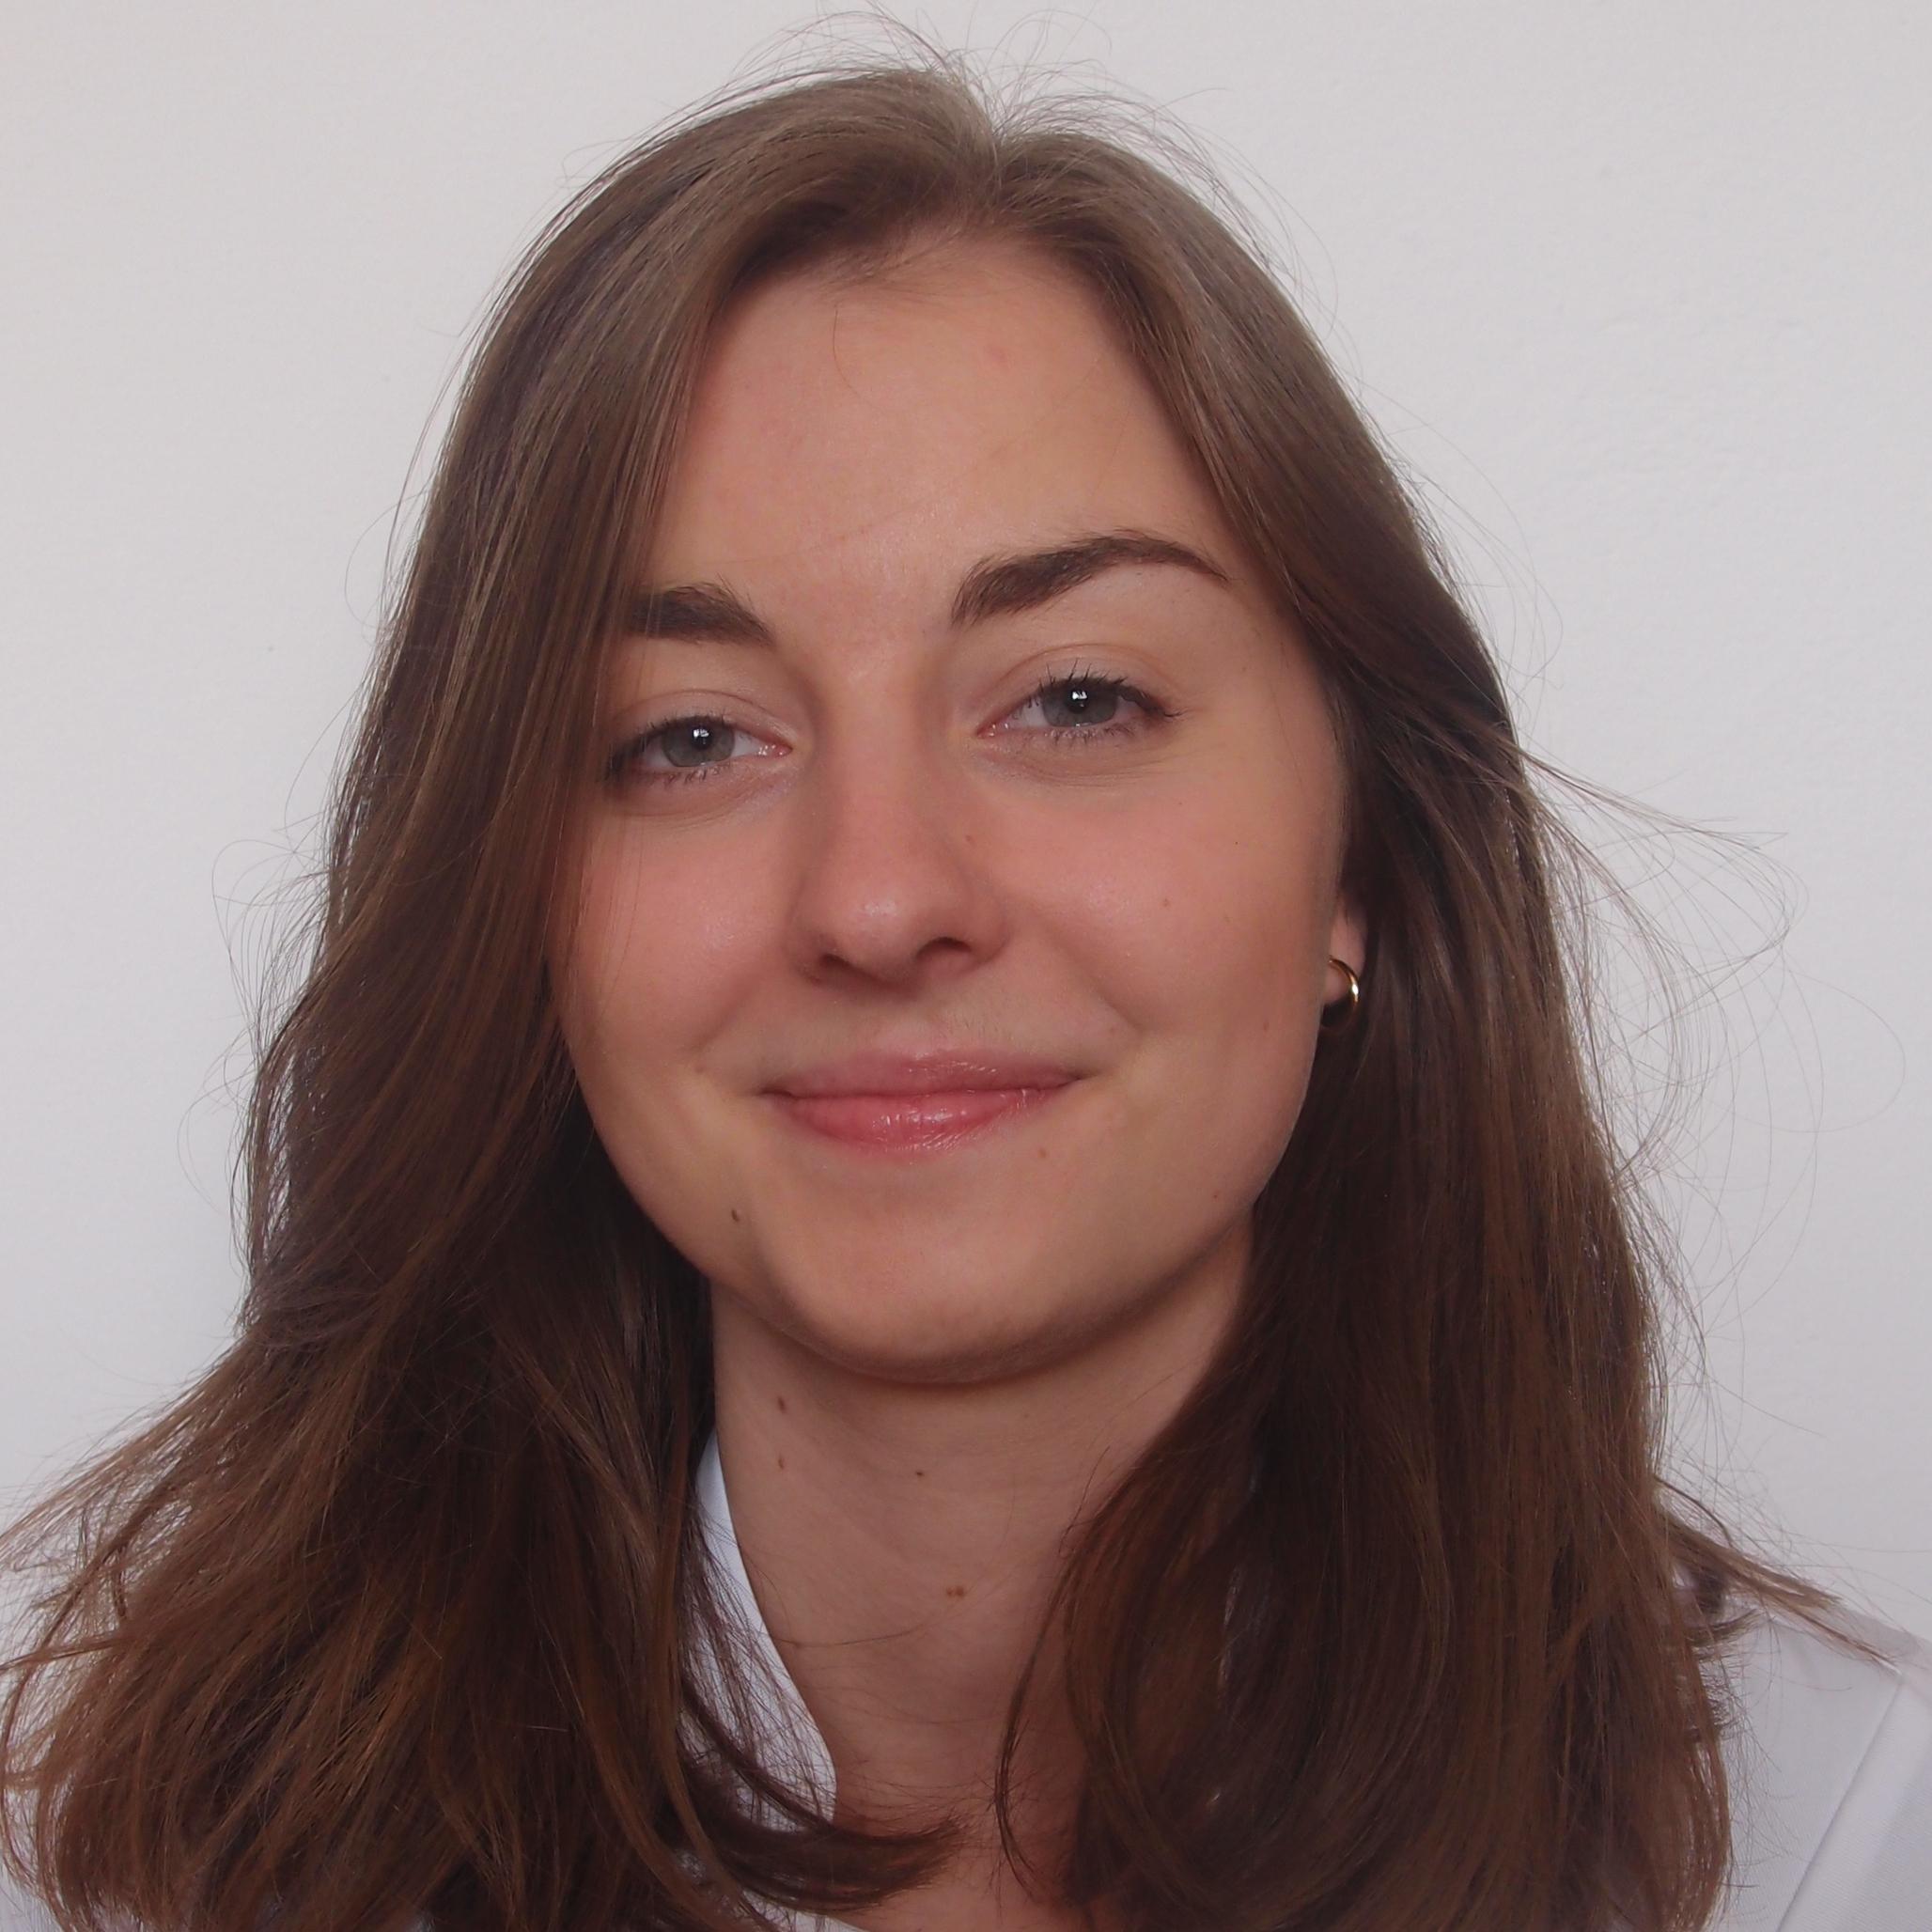 Justyna Muszyńska